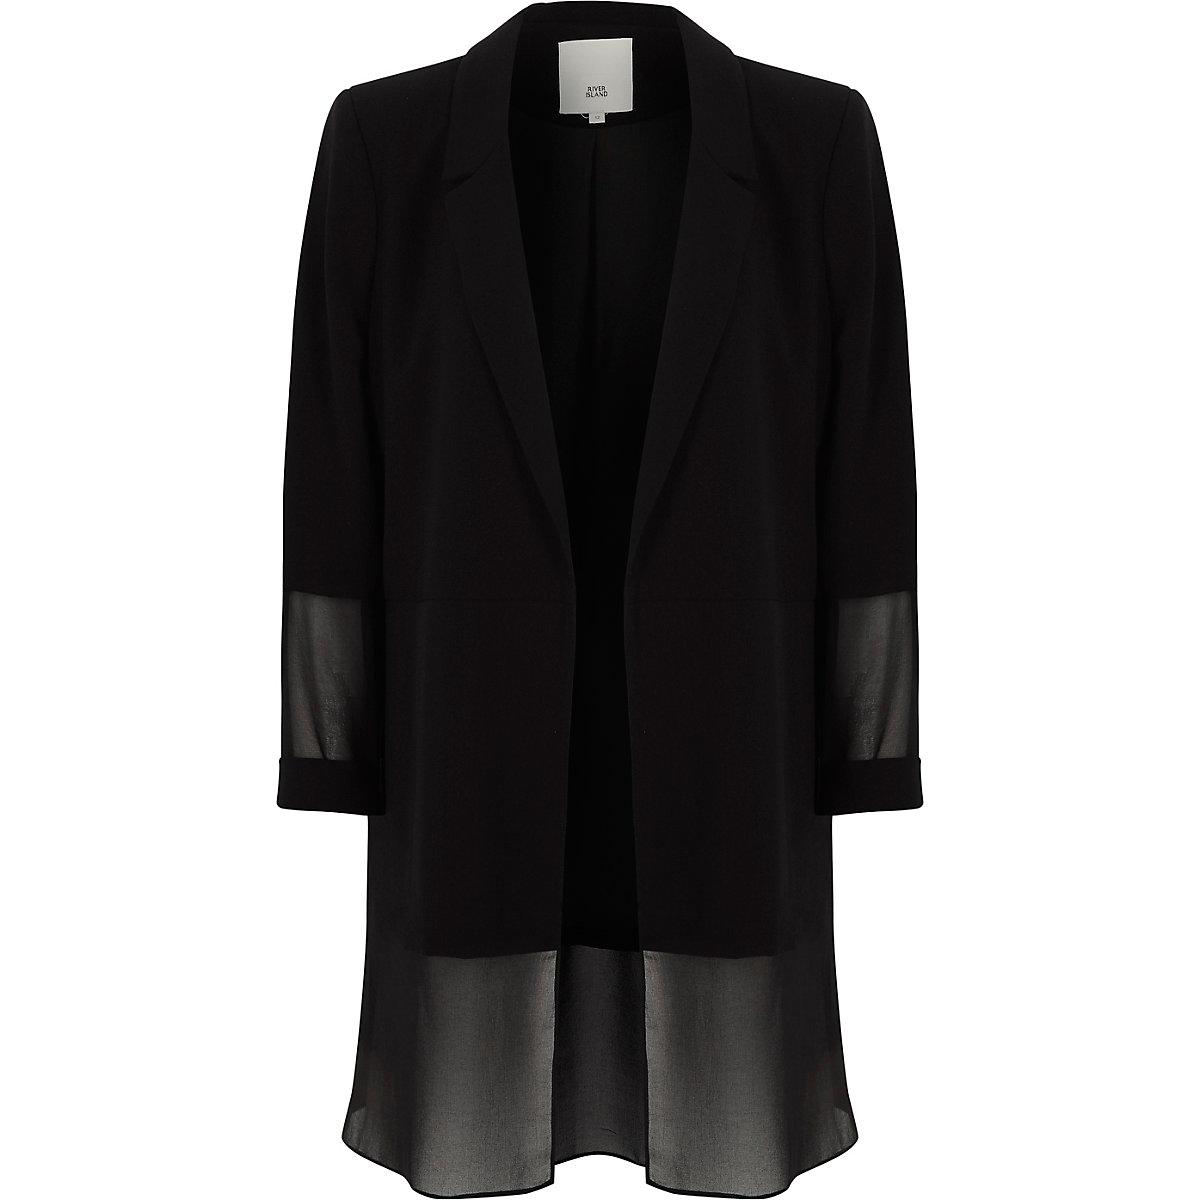 Black chiffon layer blazer